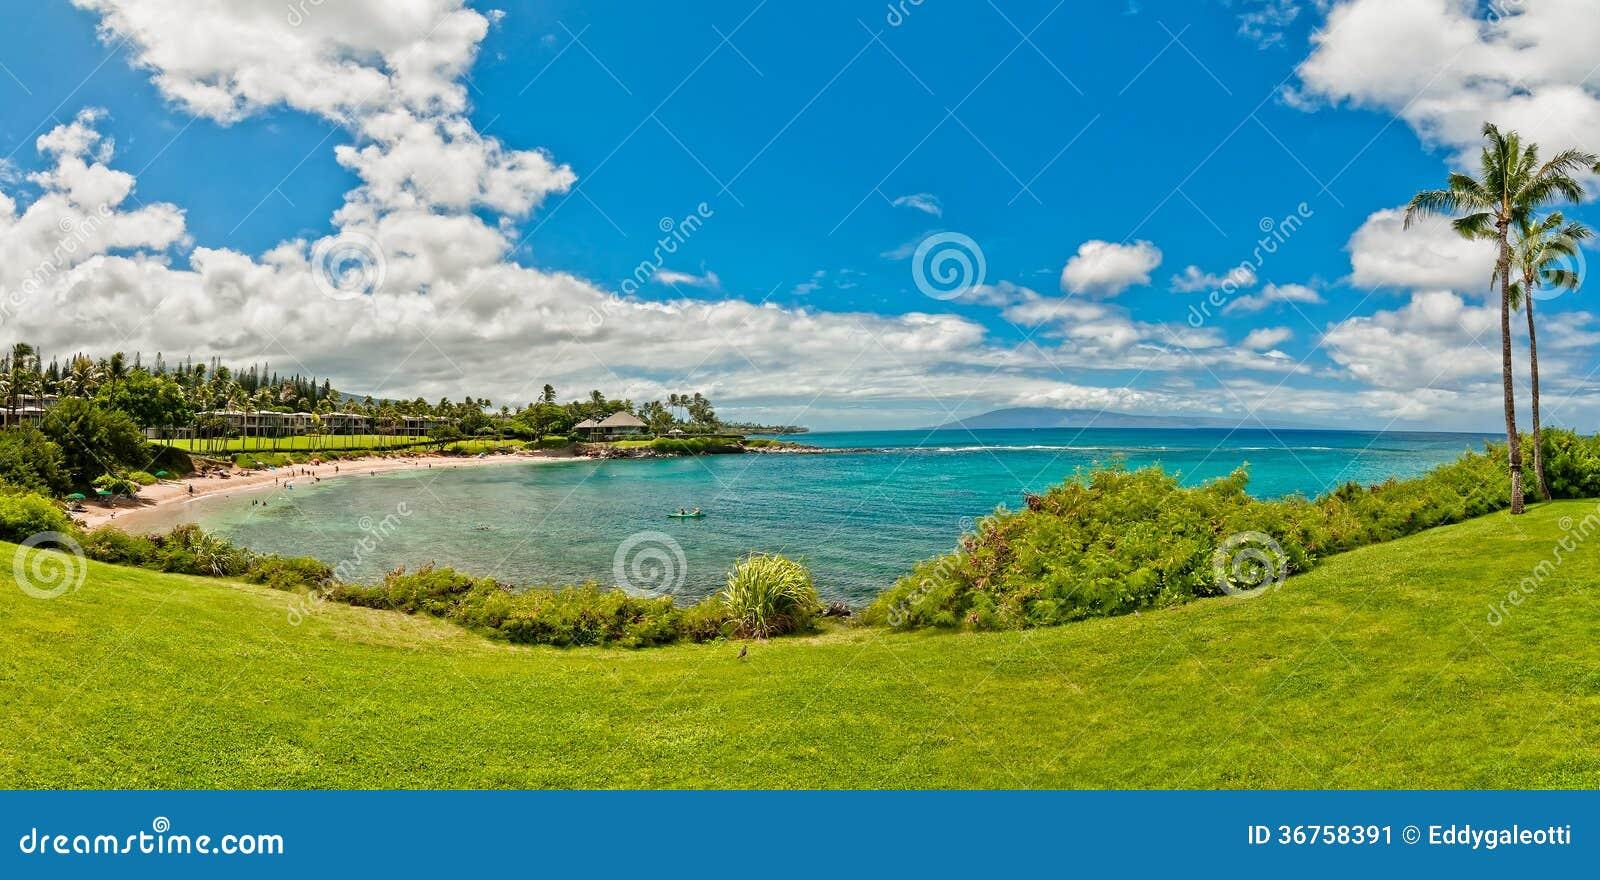 Ocean View In West Maui Kaanapali Beach Resort Area Stock